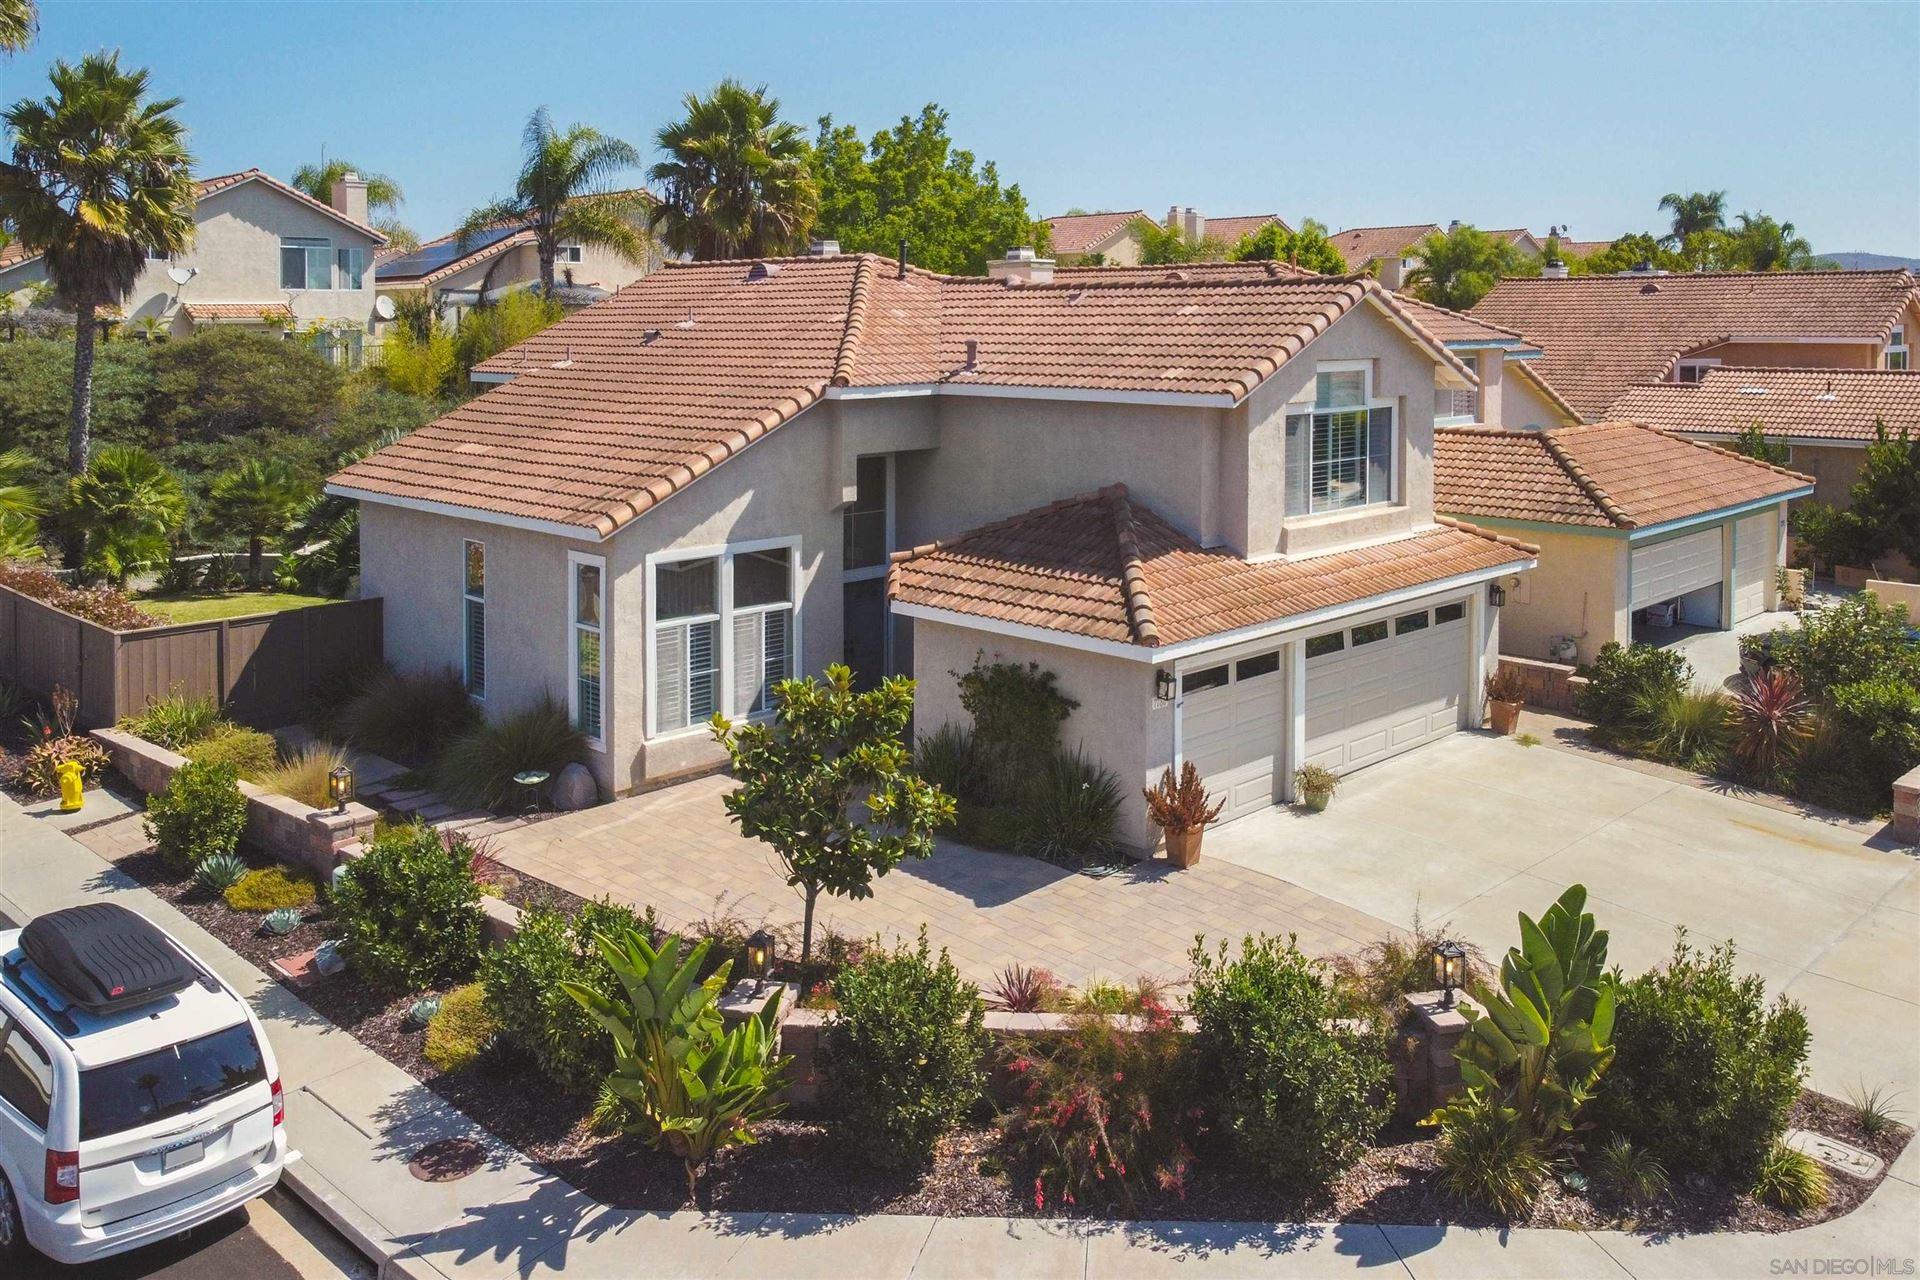 Photo of 7786 Goldfish Way, San Diego, CA 92129 (MLS # 210026636)